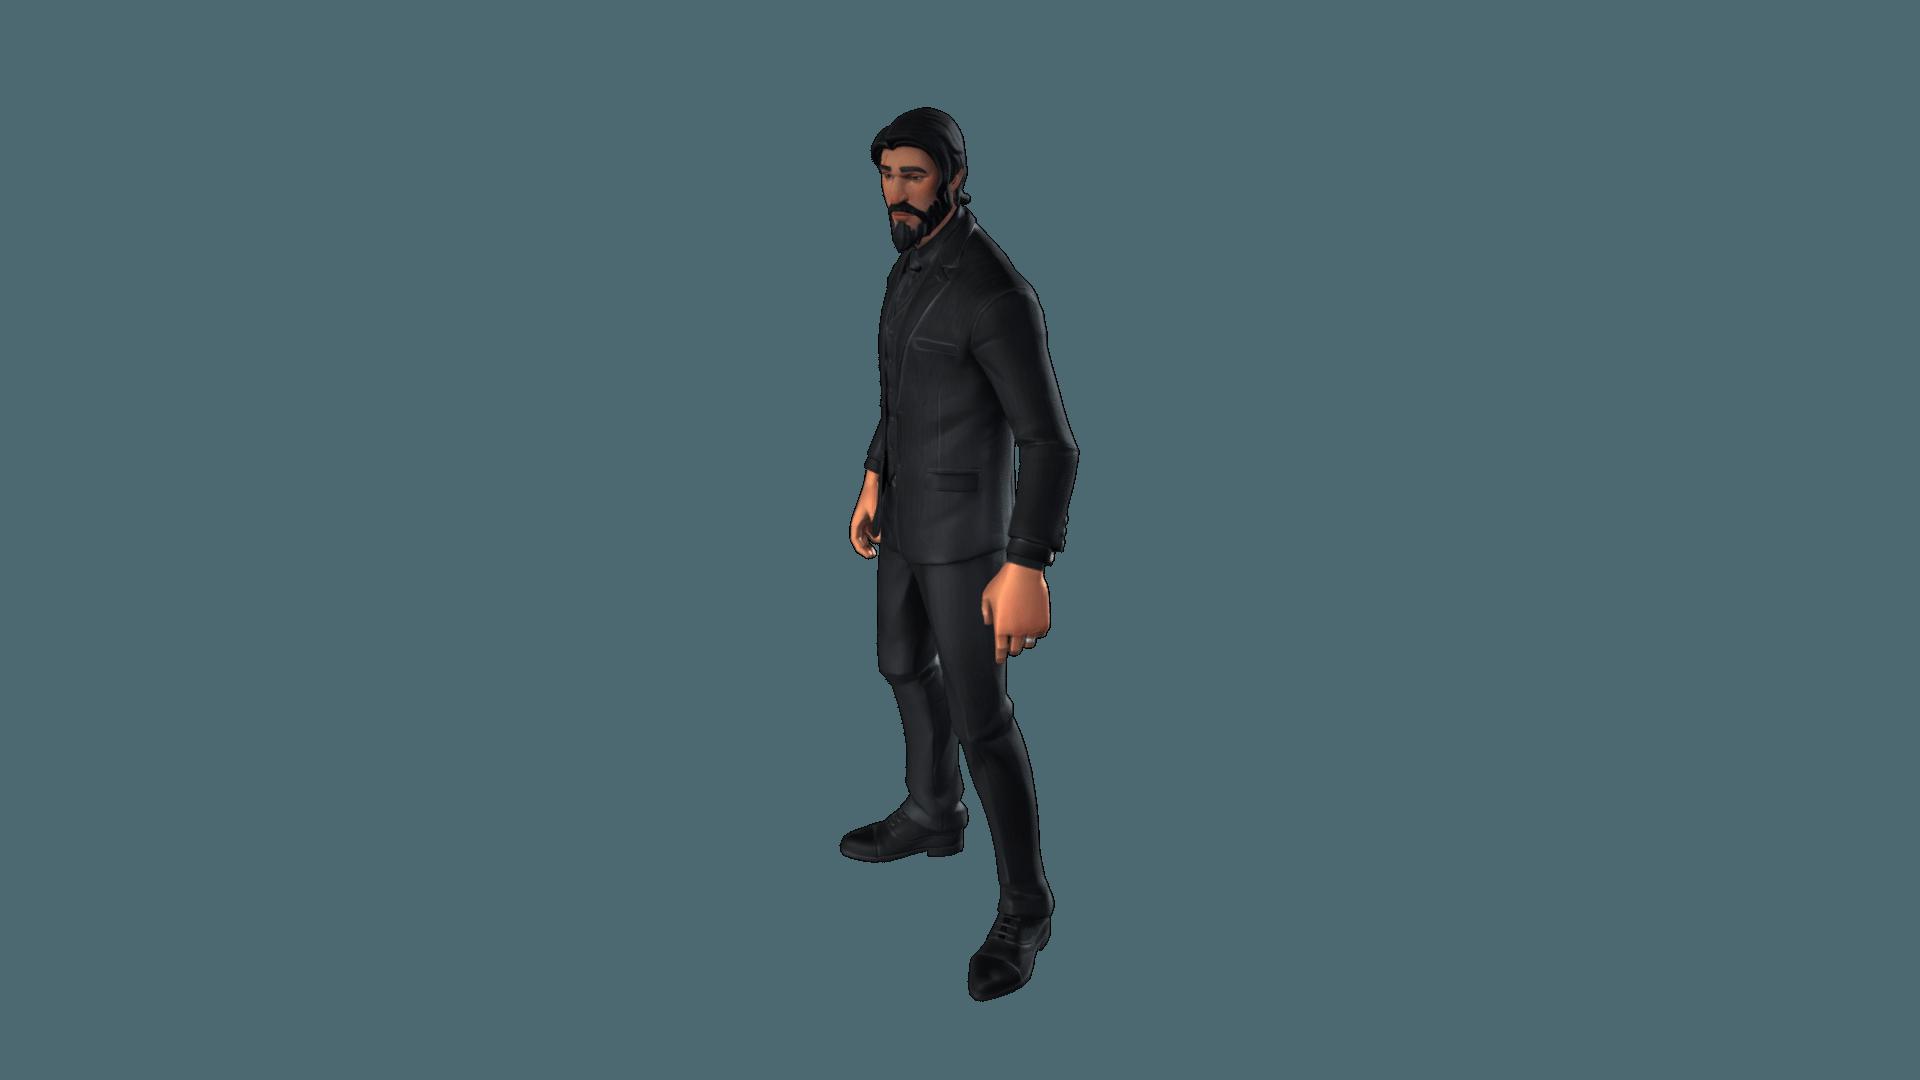 Fire John Wick Fortnite Skin | Fortnite Free 3d Models